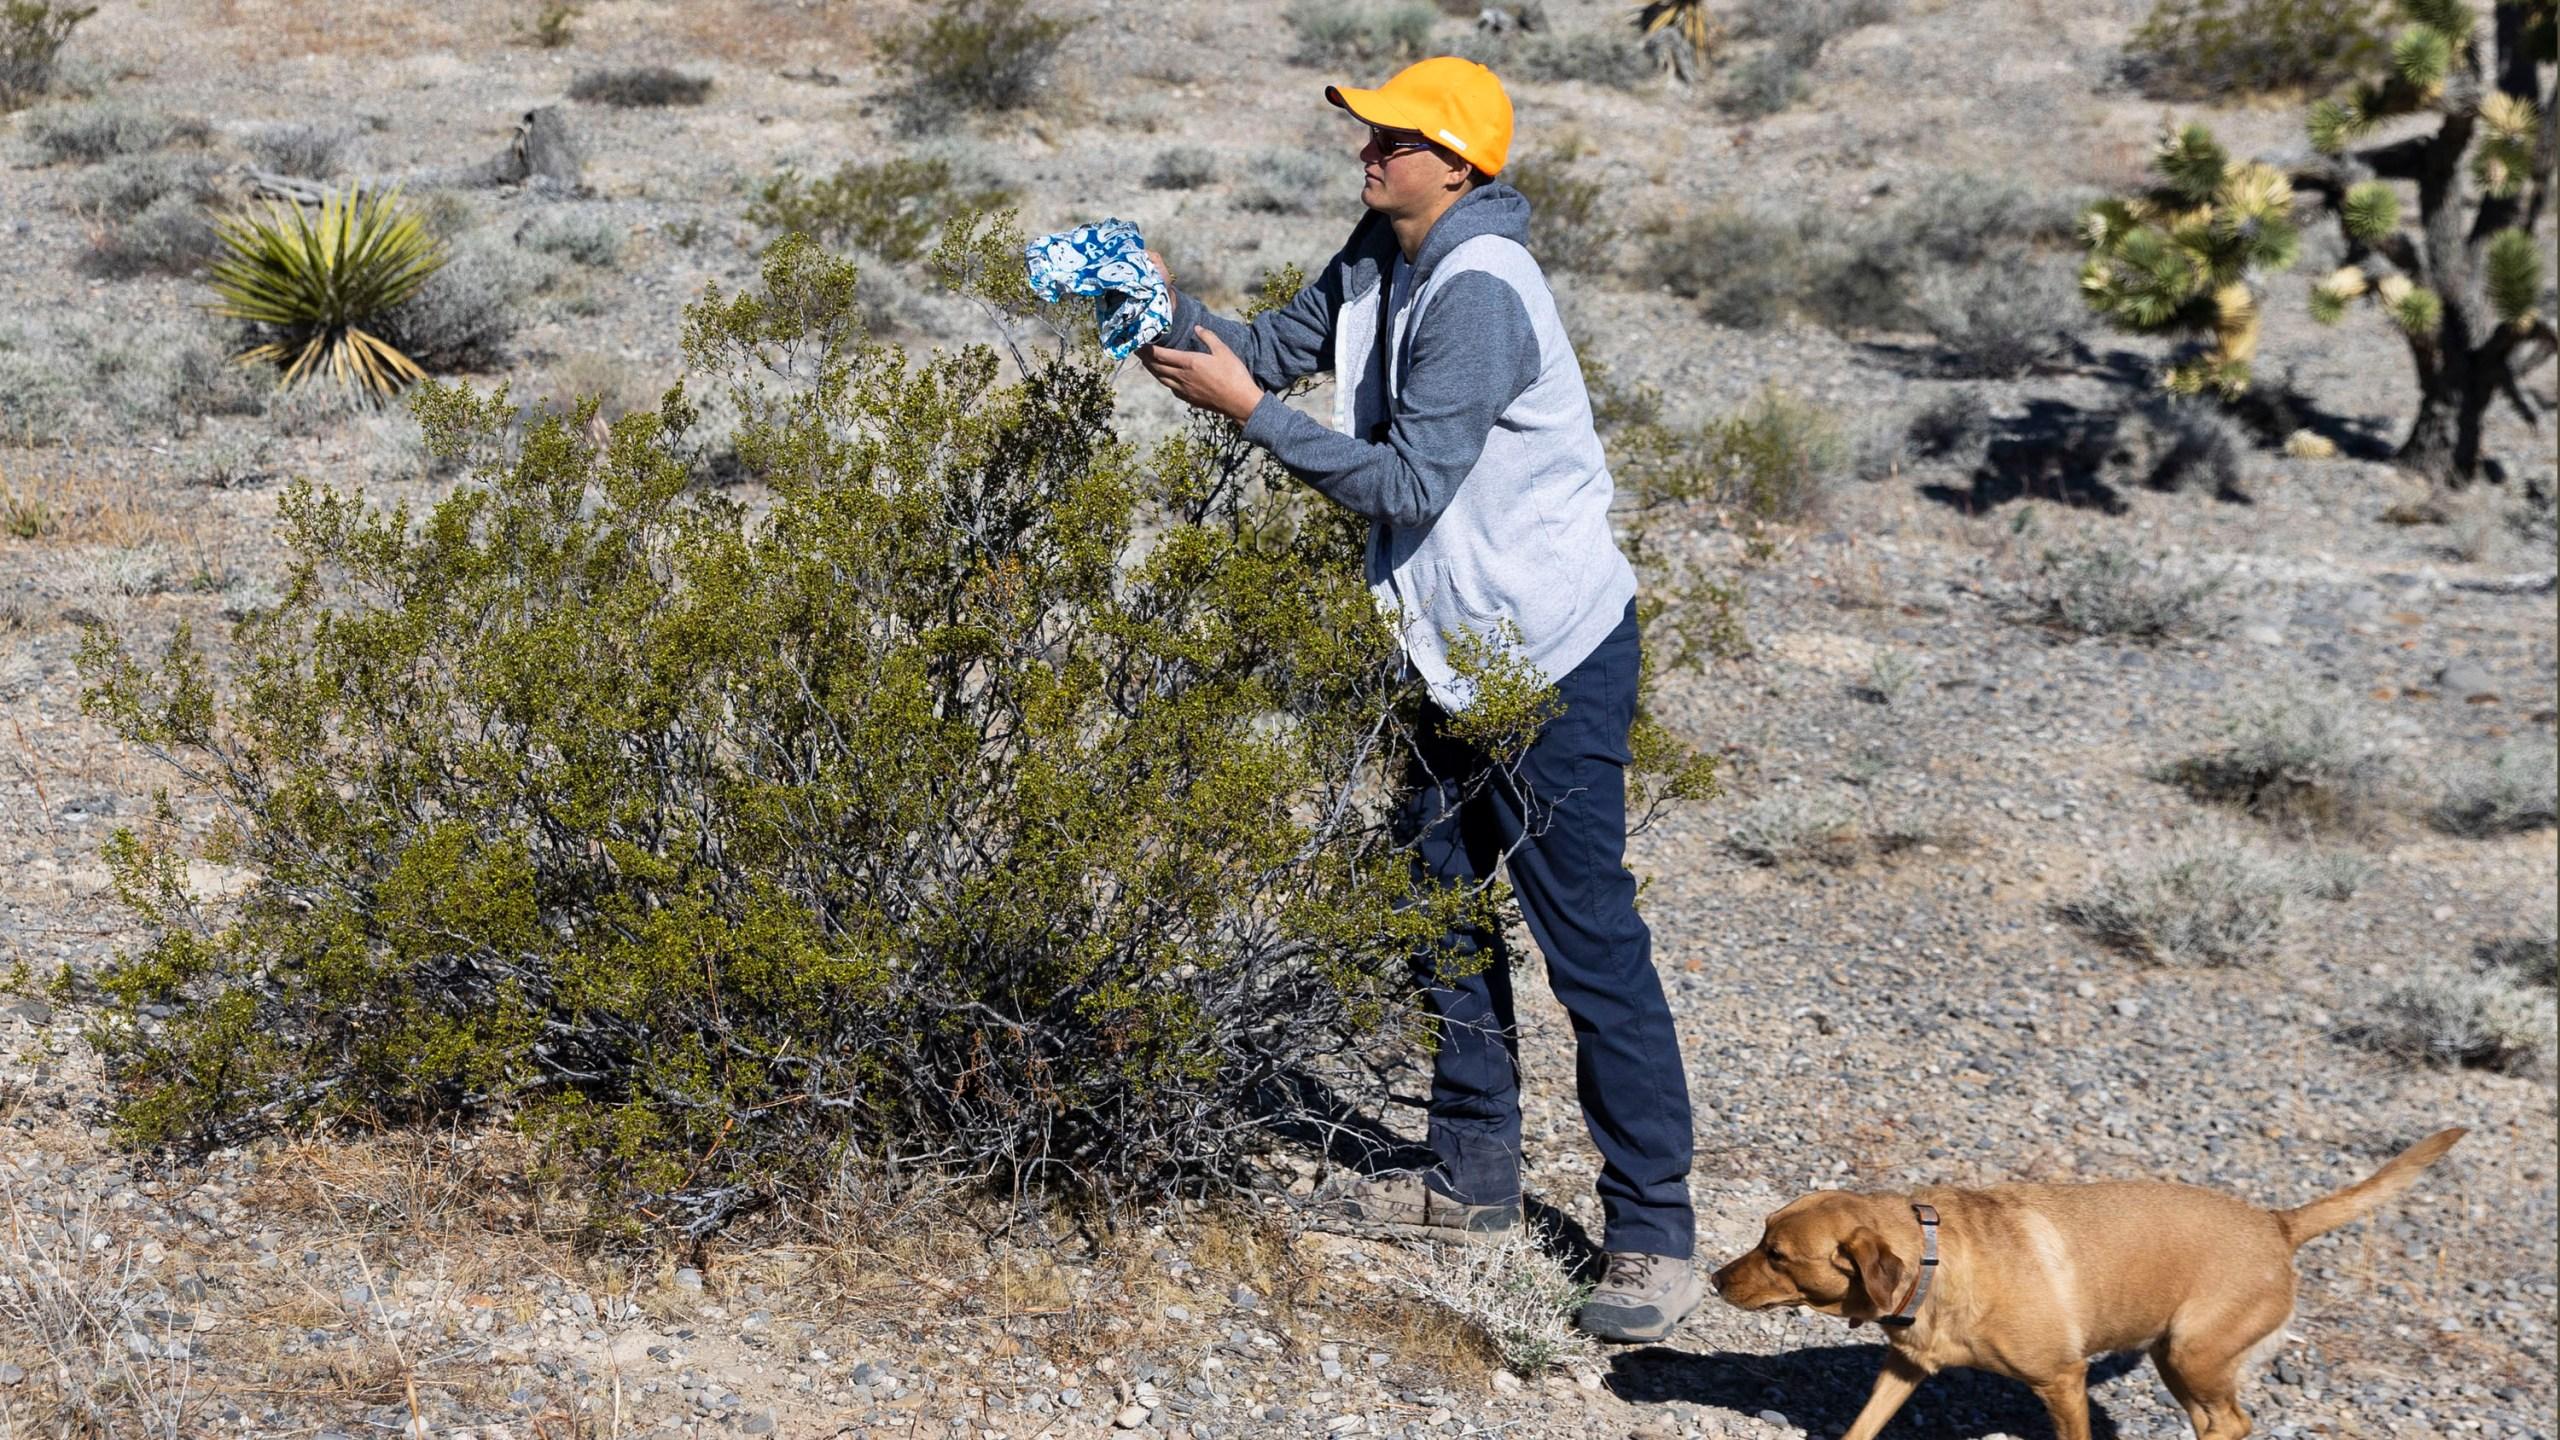 Christian Daniels, 15, retrieves stray balloon from desert areas with his dog Ruby, on Saturday, April 17, 2021, in Las Vegas. (Bizuayehu Tesfaye/Las Vegas Review-Journal via AP)